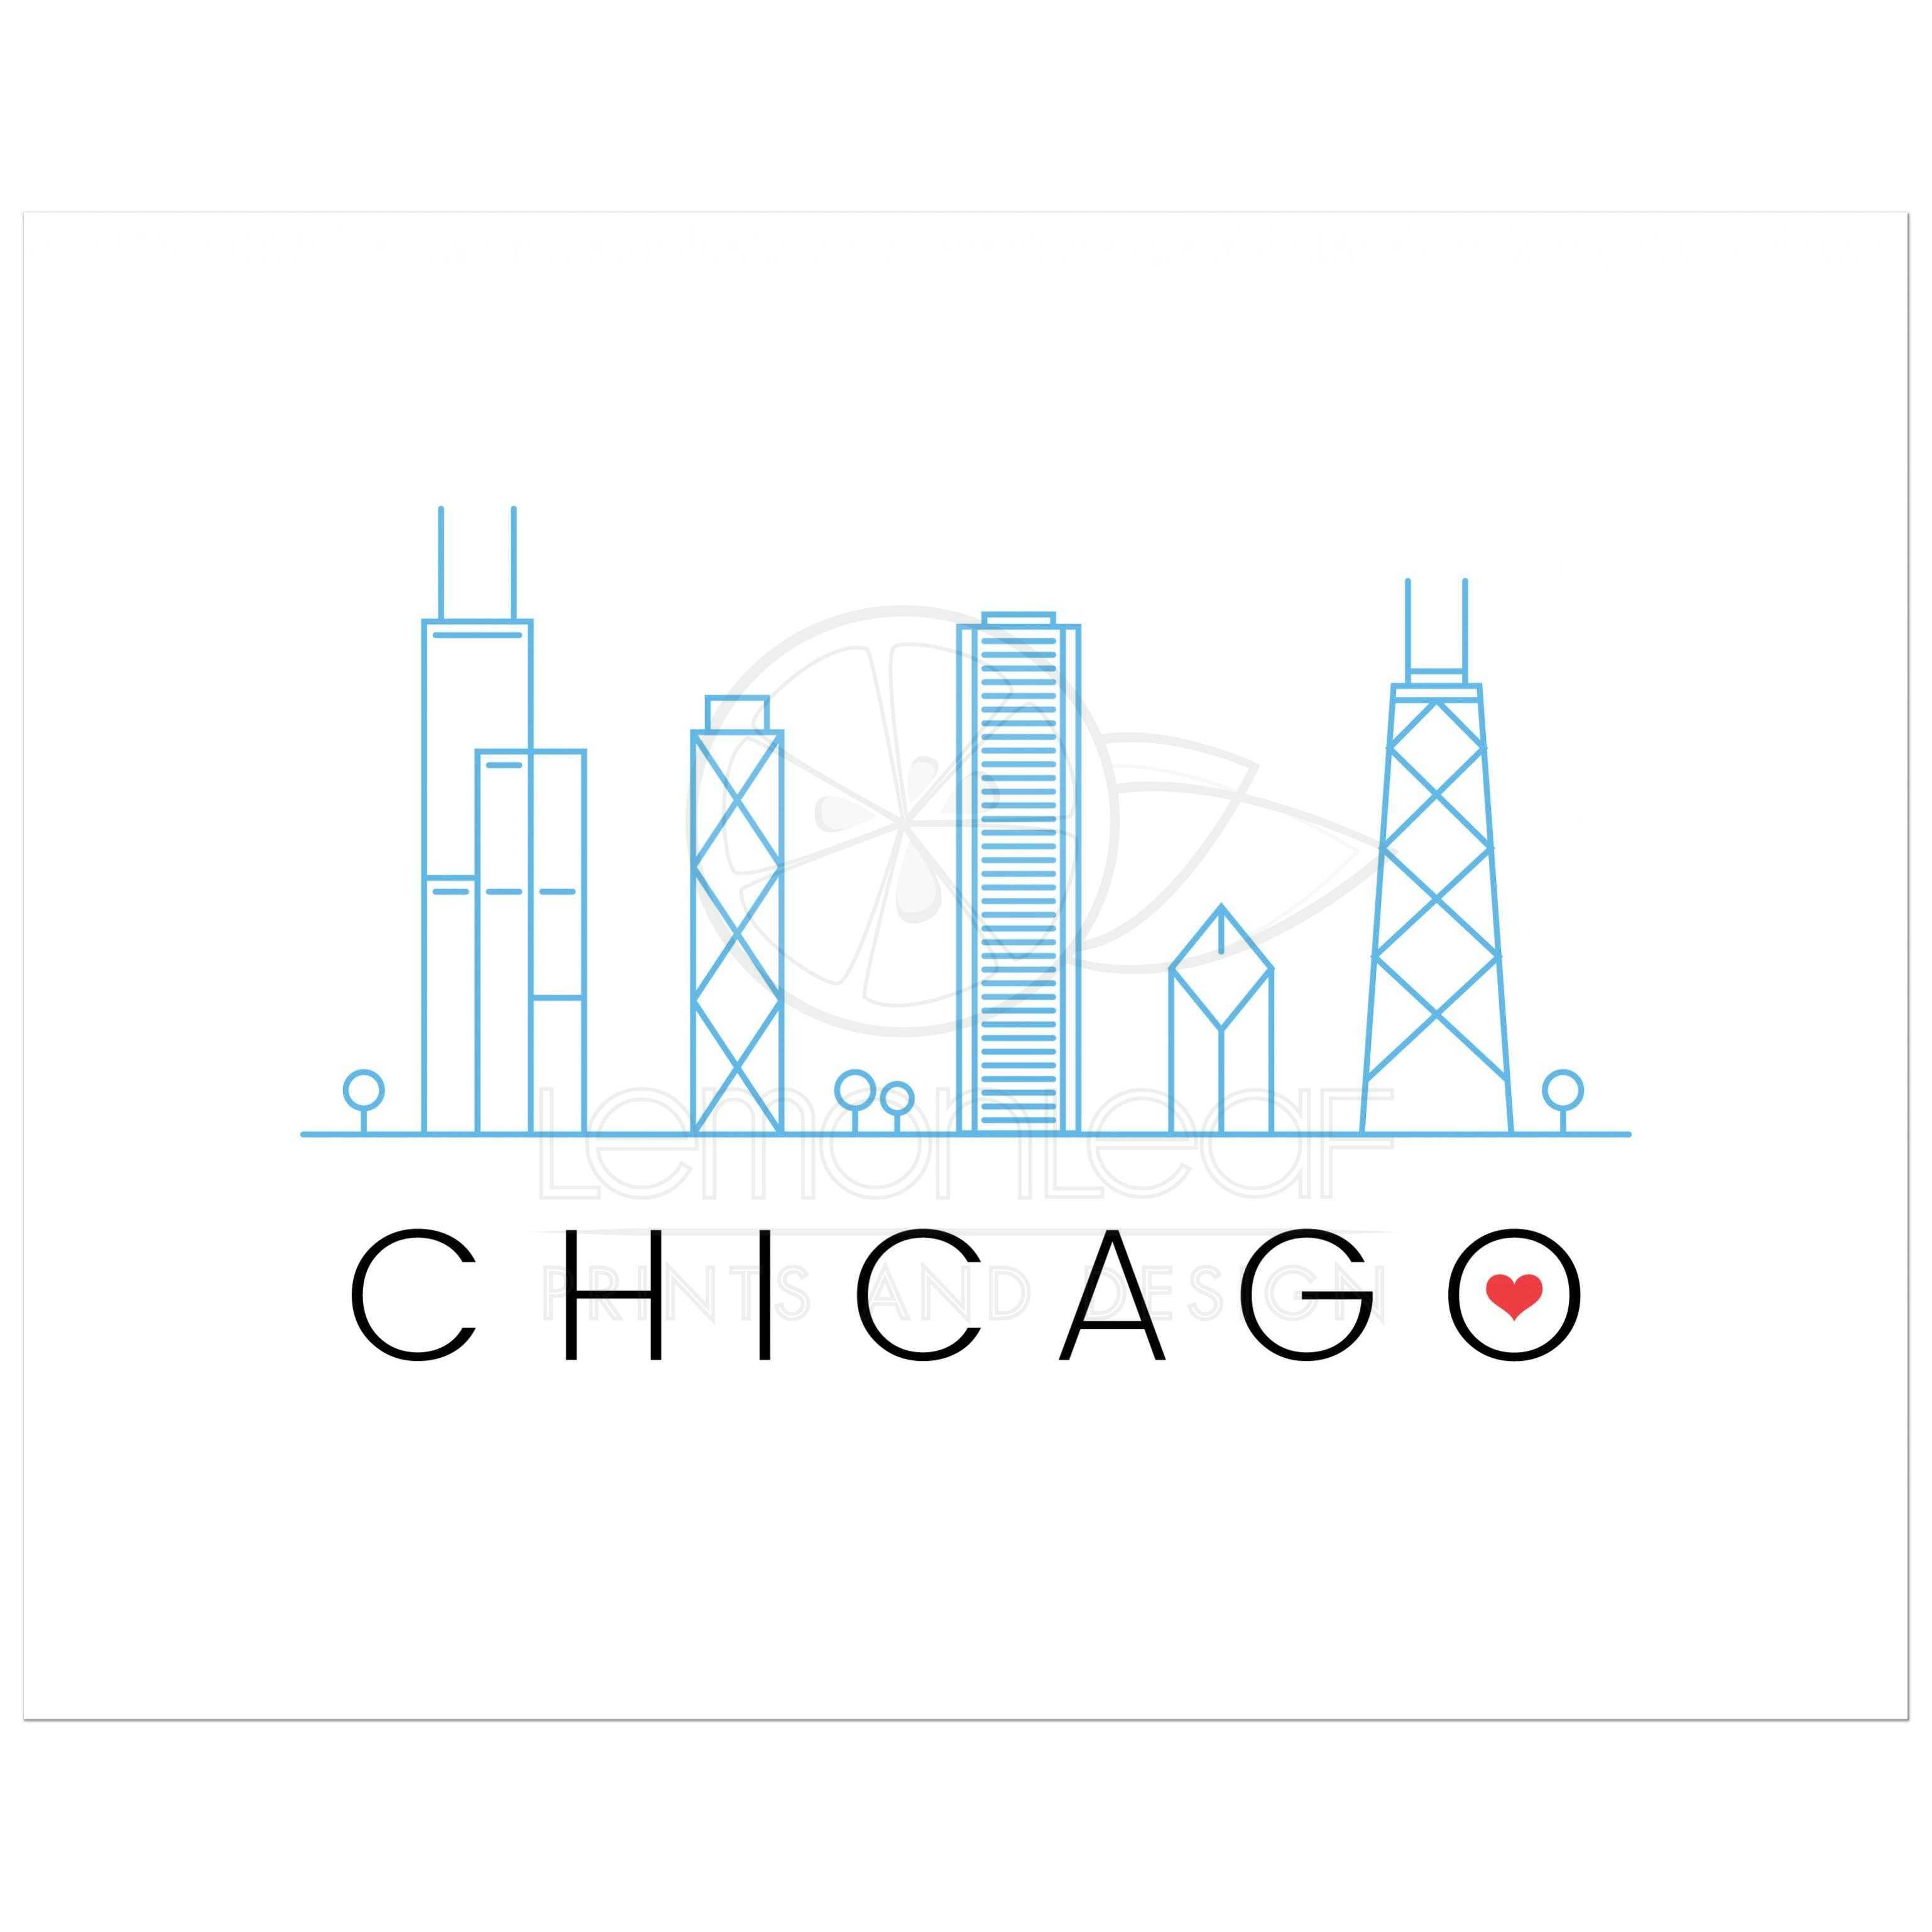 Chicago Skyline Wall Art chicago skyline art print - modern, minimal design with red love heart